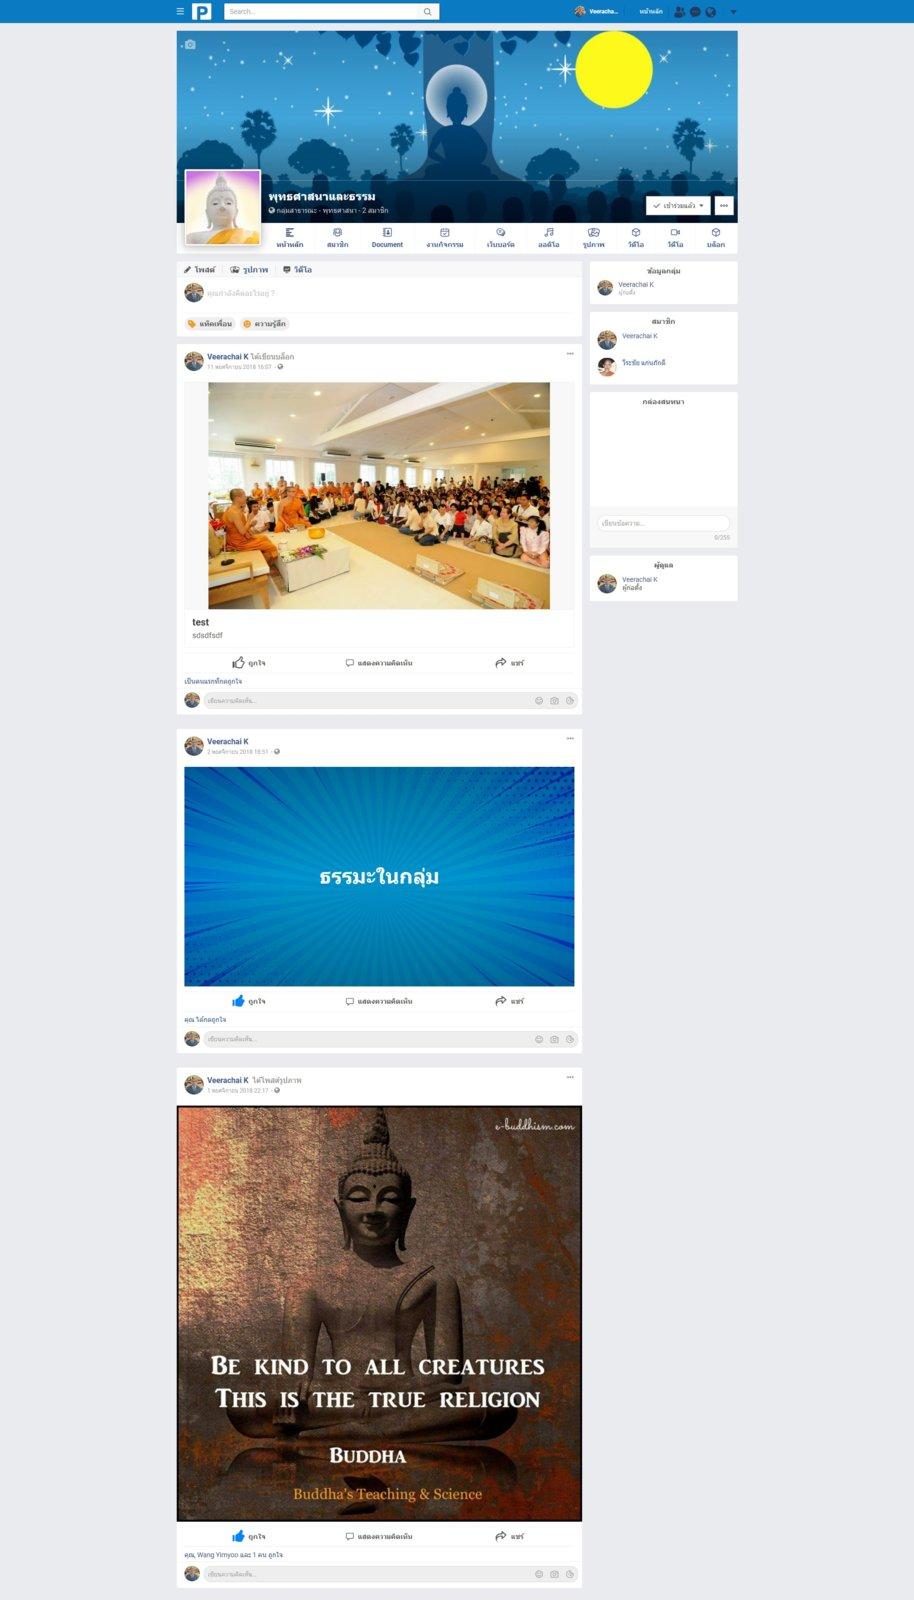 Screenshot_2018-12-25 พลังจิต พุทธศาสนาและธรรมะ(2).jpg